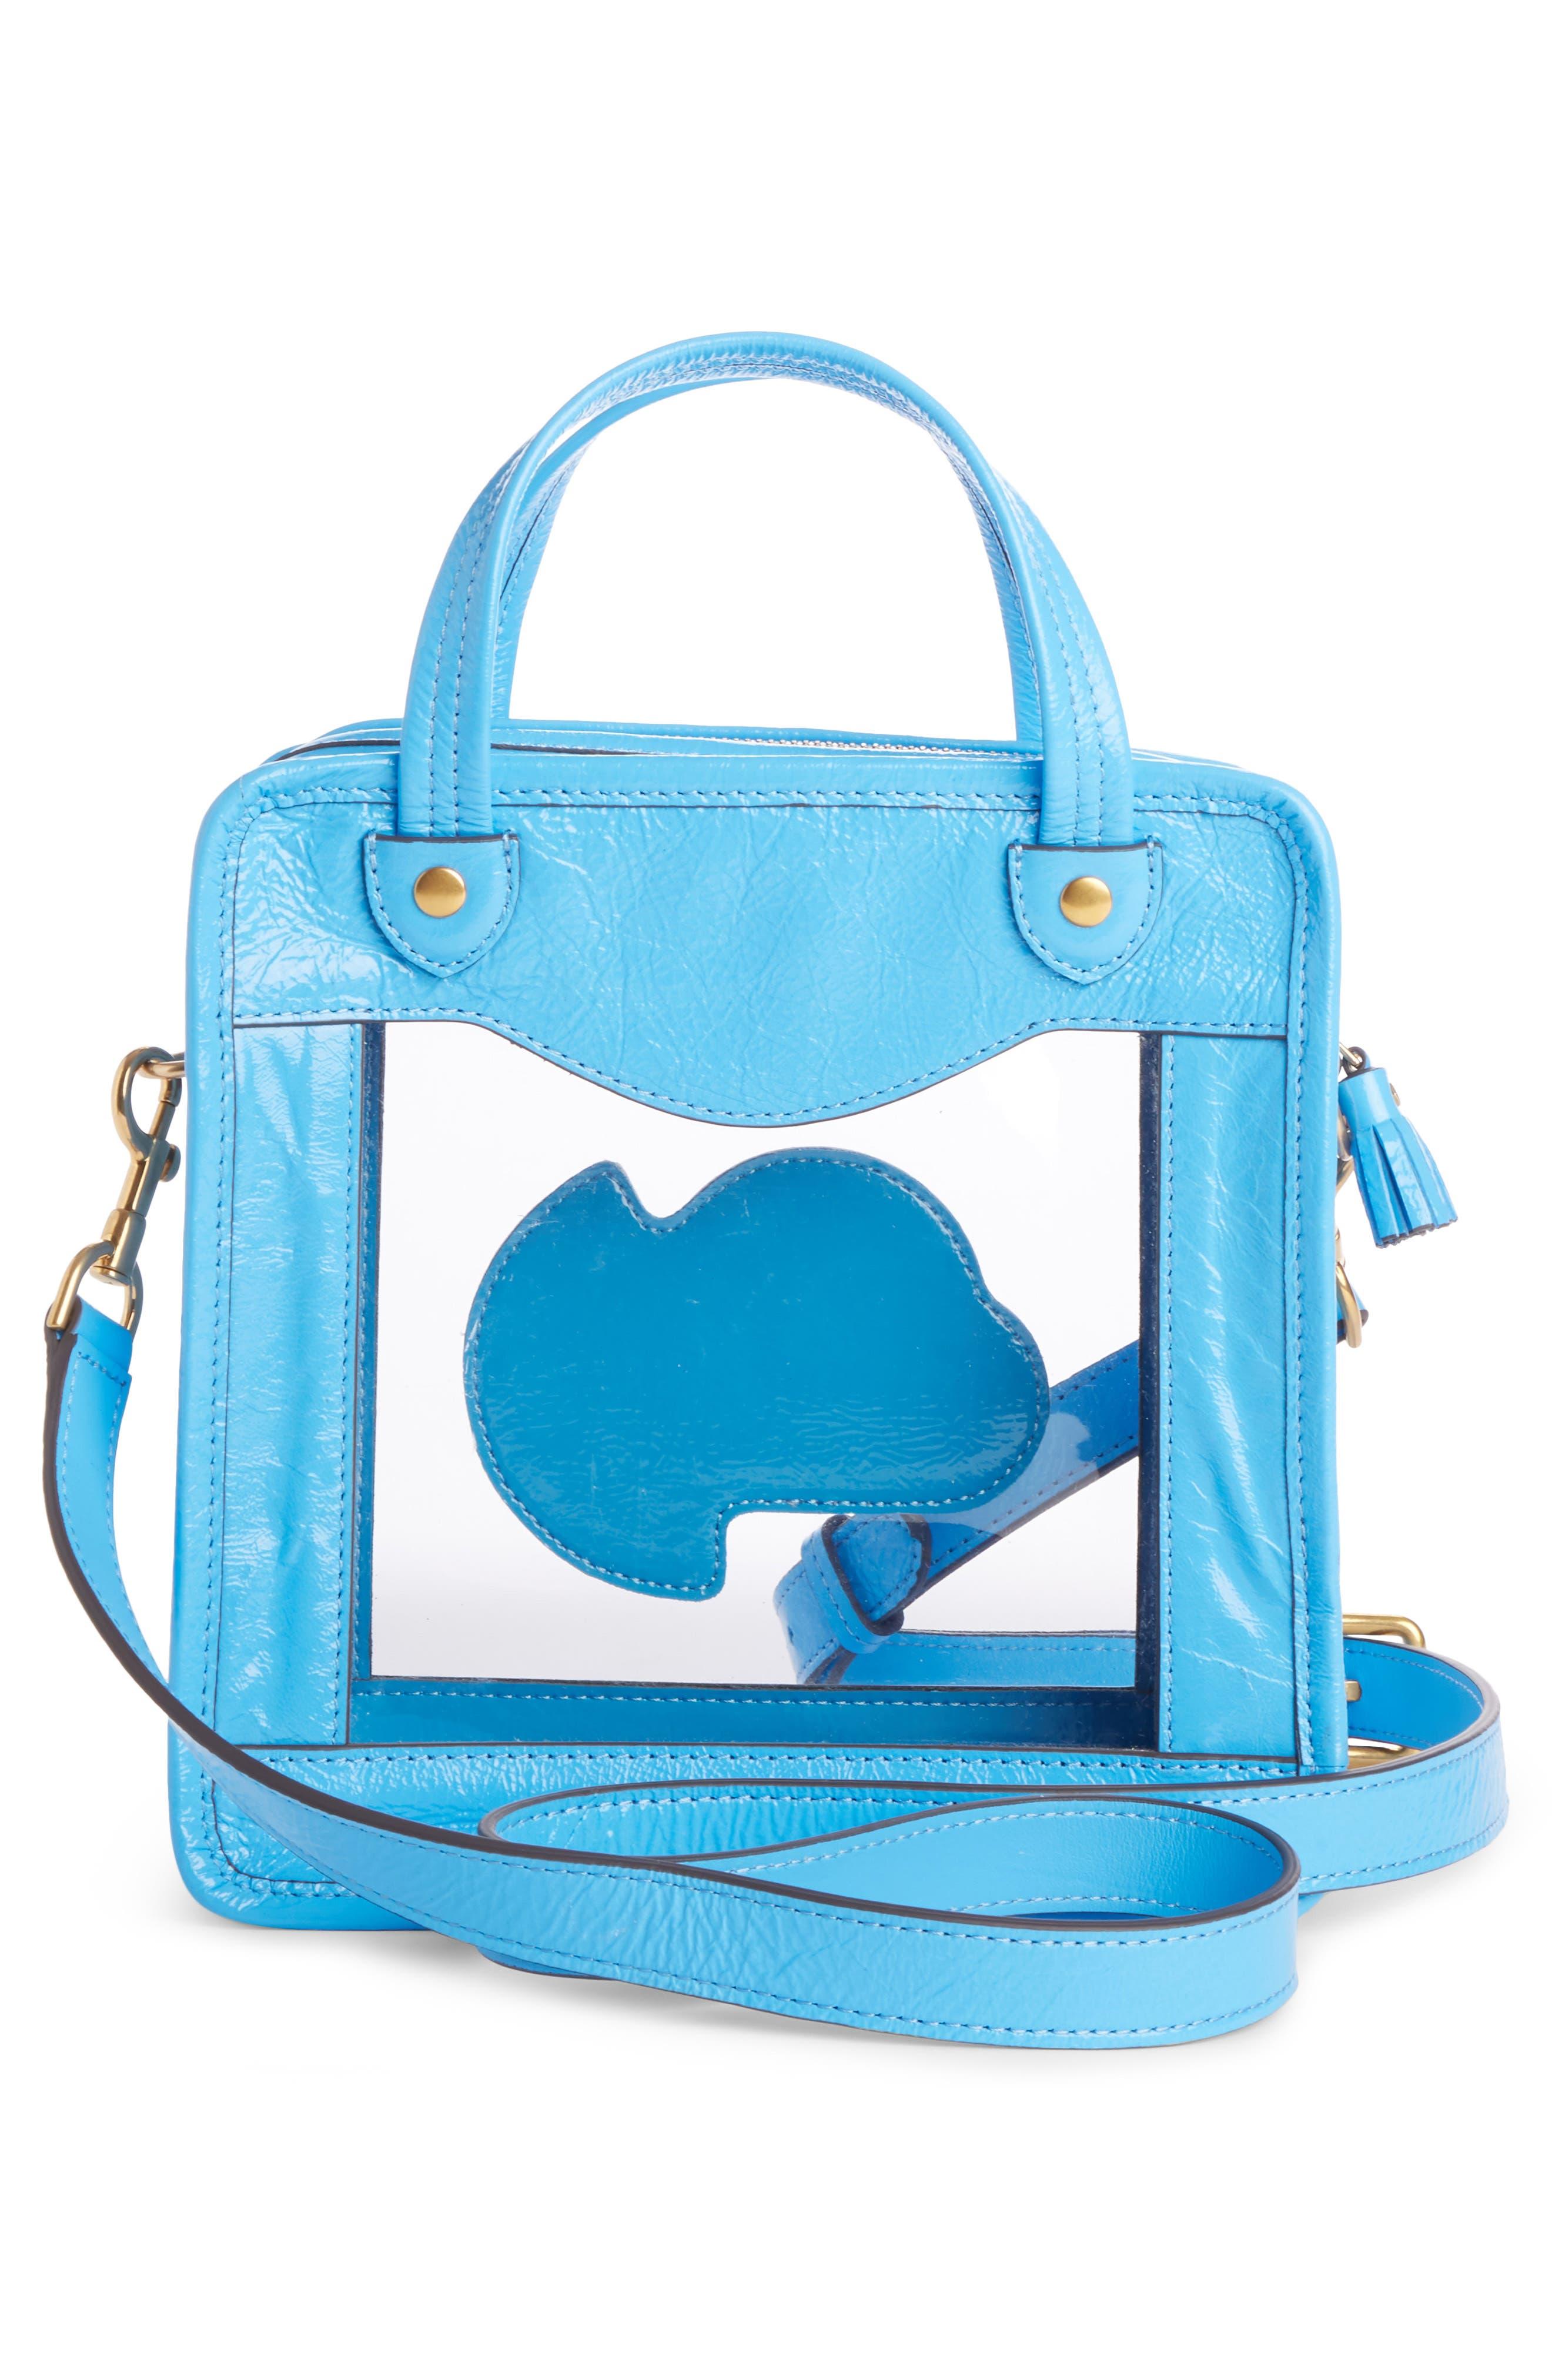 Rainy Day Crossbody Bag,                             Alternate thumbnail 2, color,                             Blue Quilt